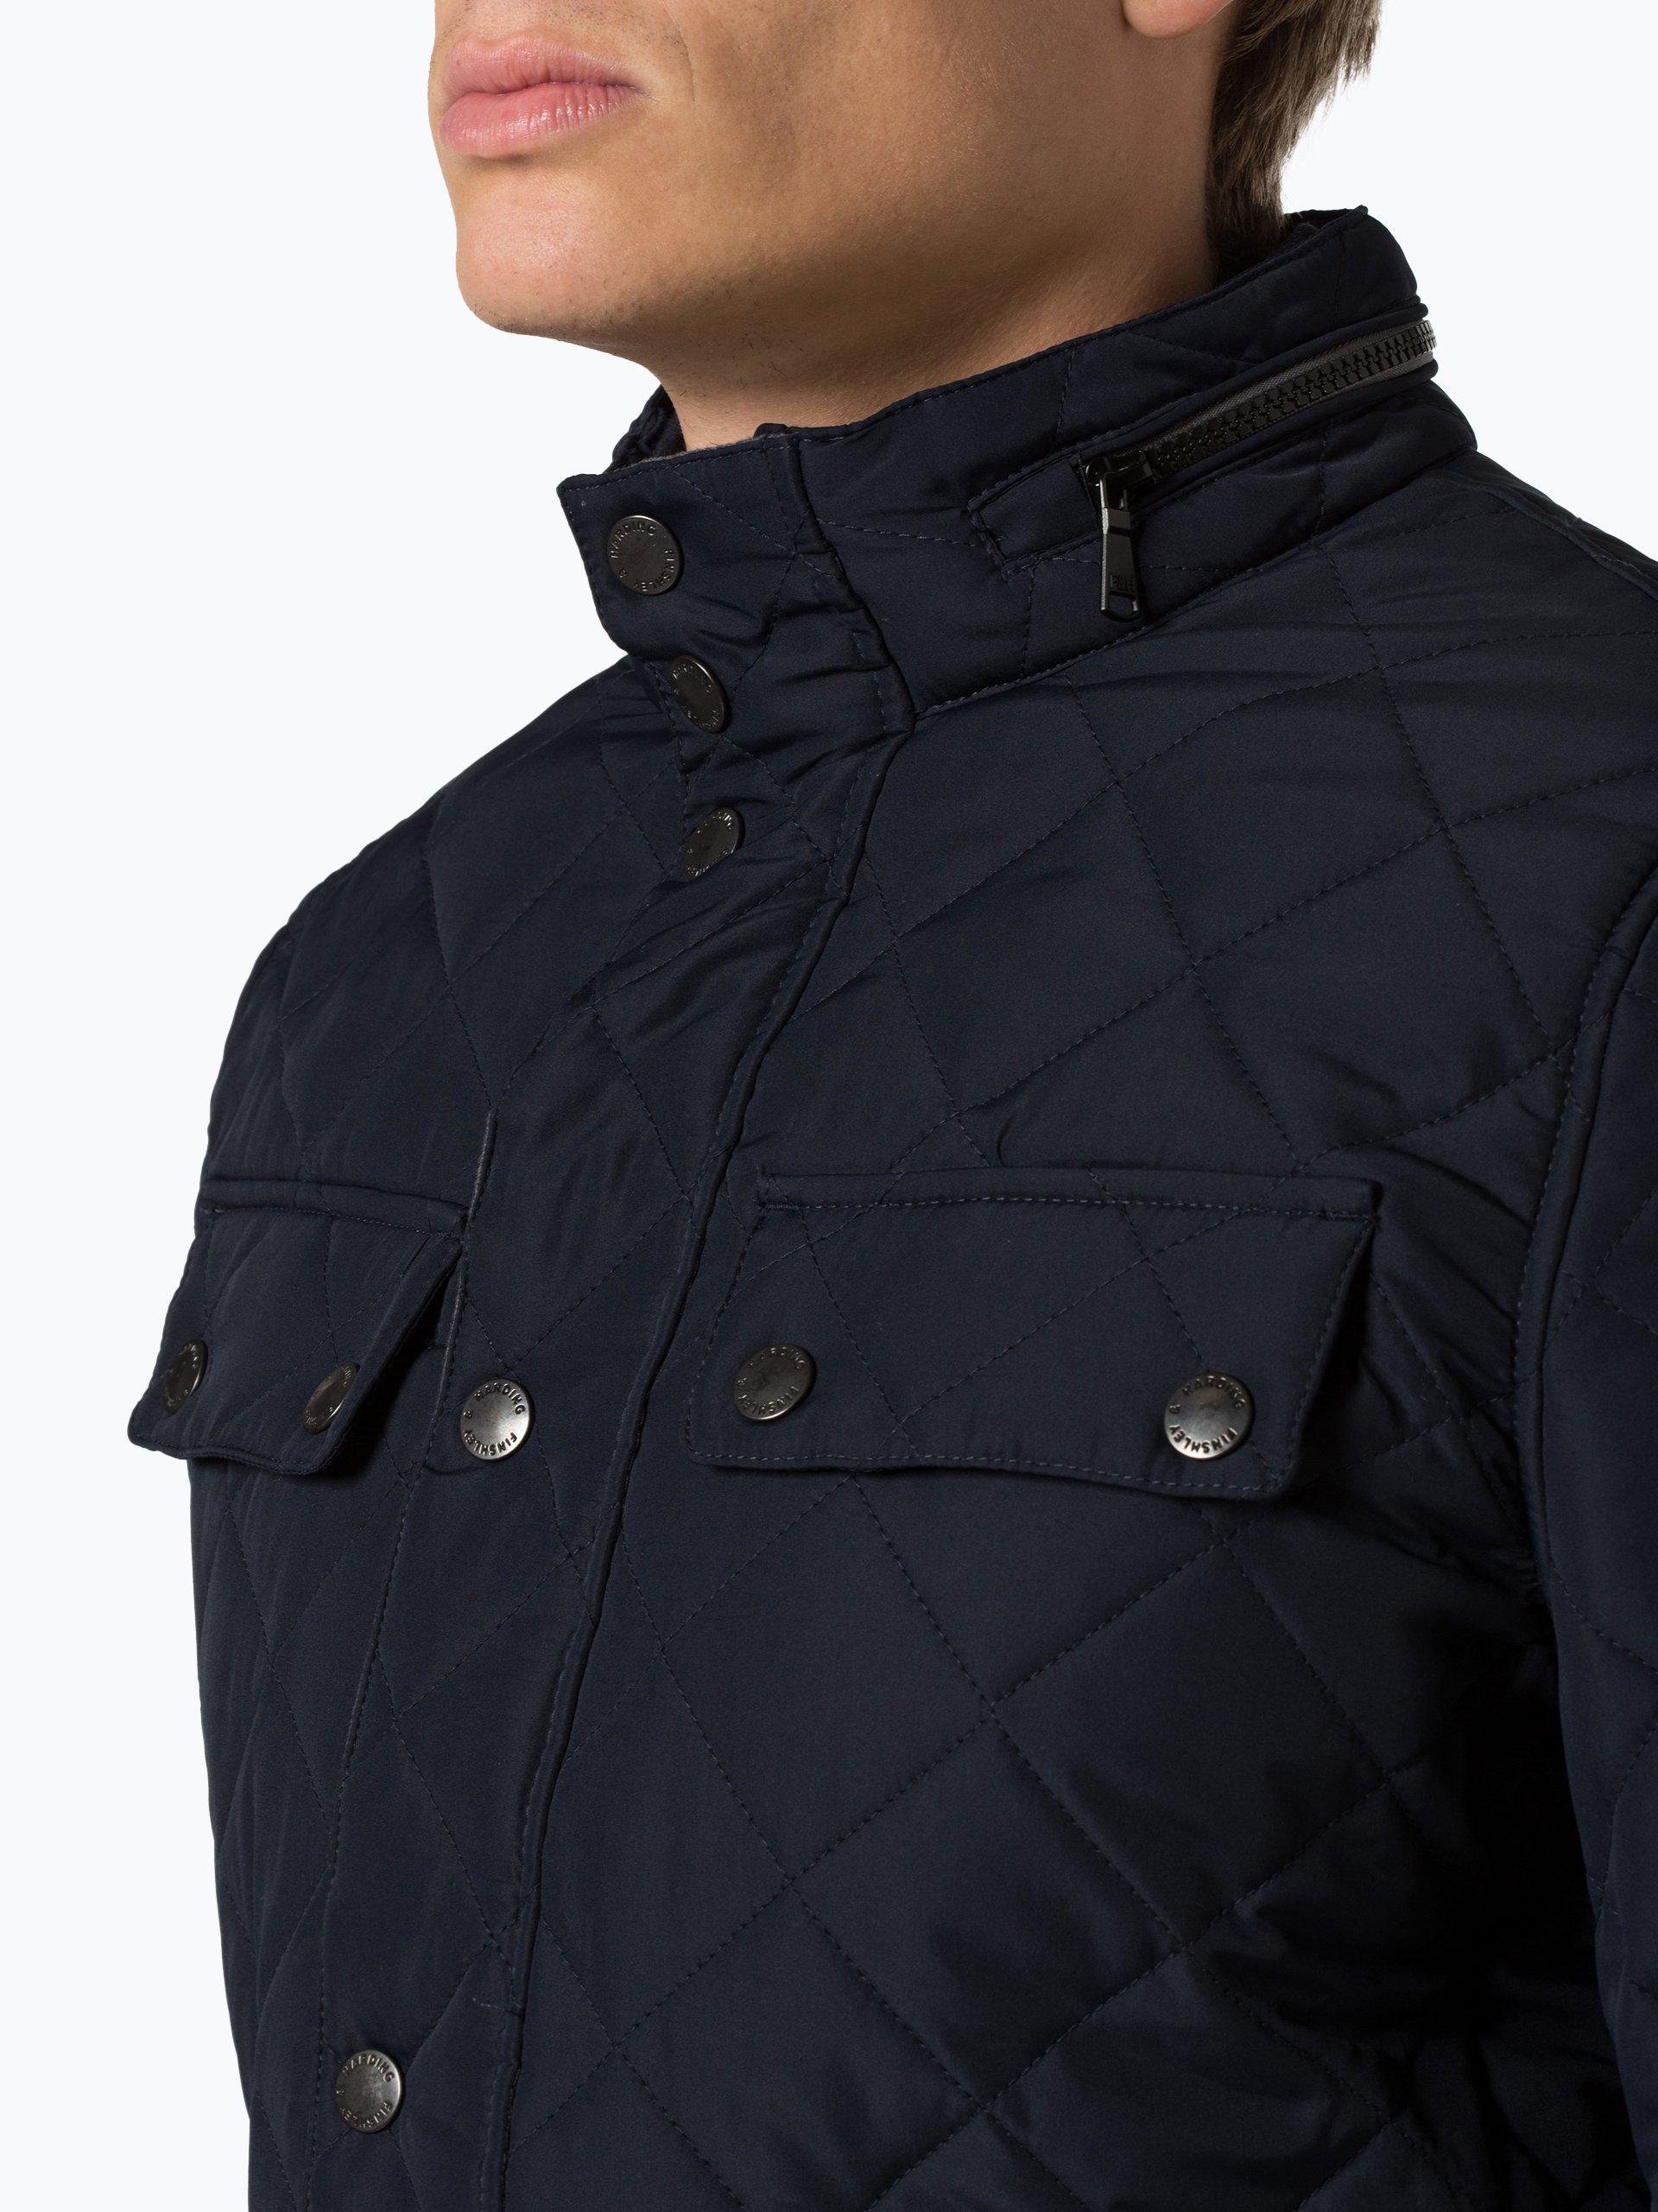 Finshley & Harding Męska kurtka pikowana